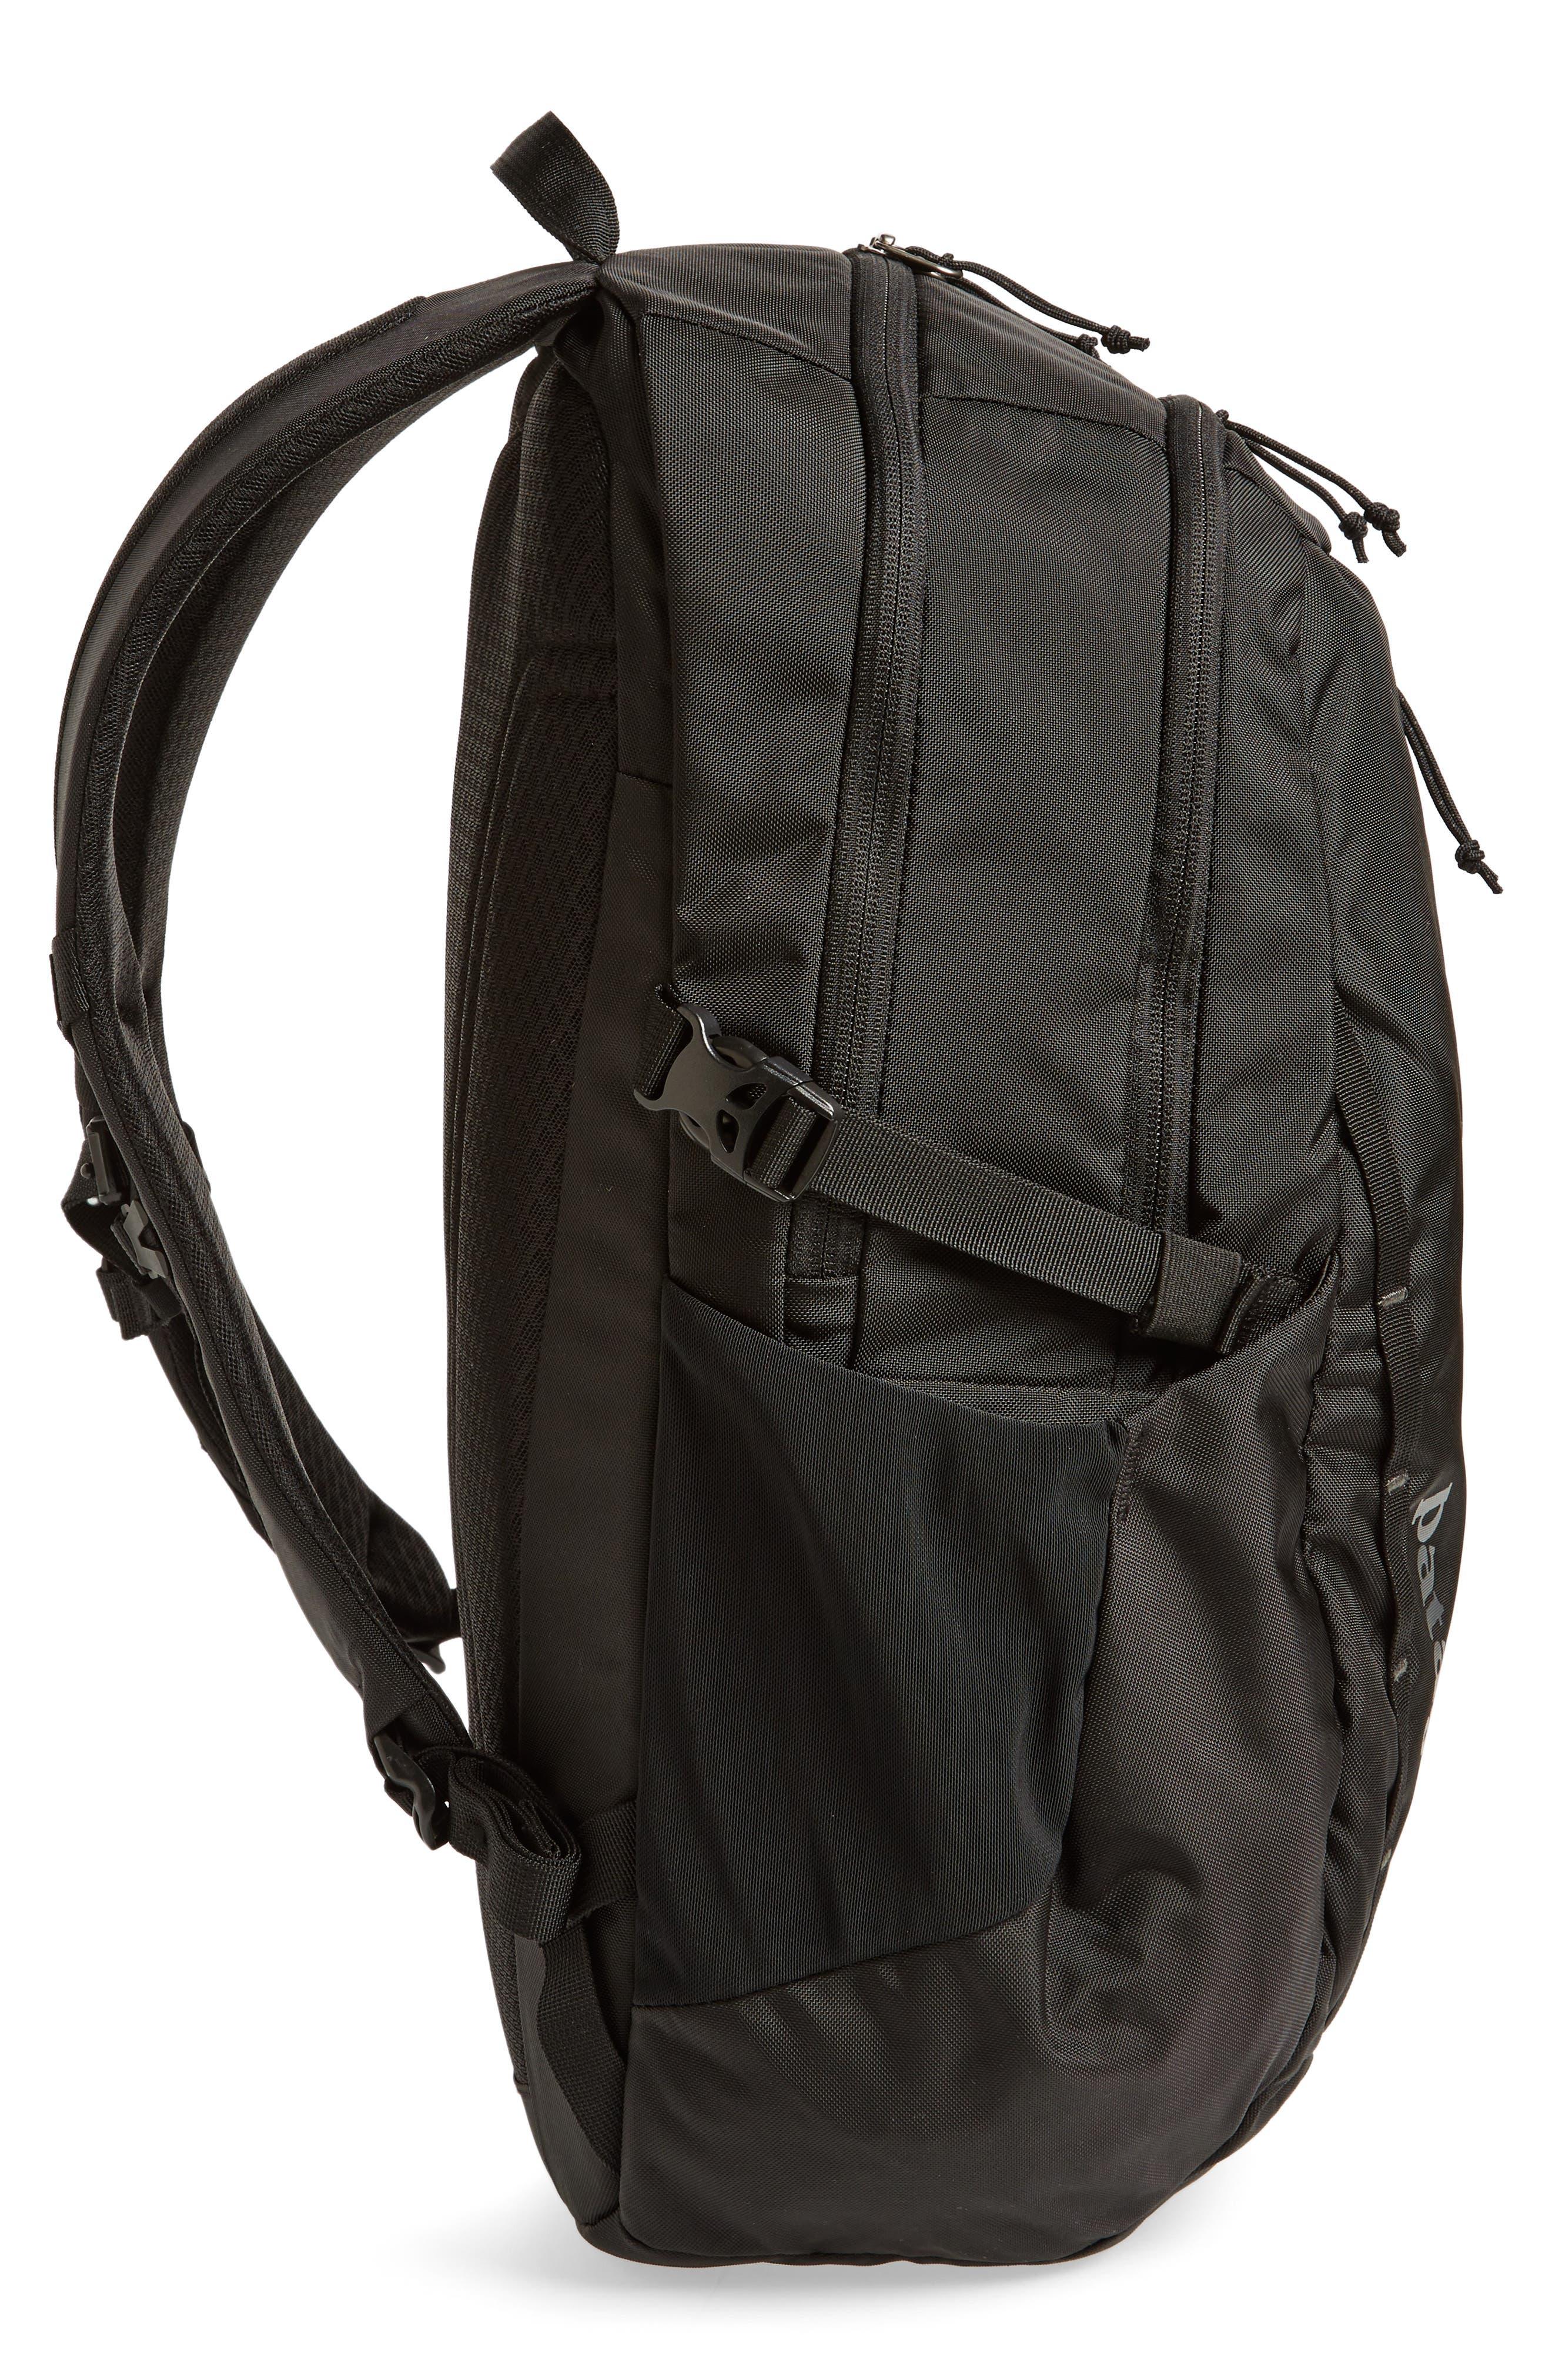 28L Refugio Backpack,                             Alternate thumbnail 5, color,                             Black